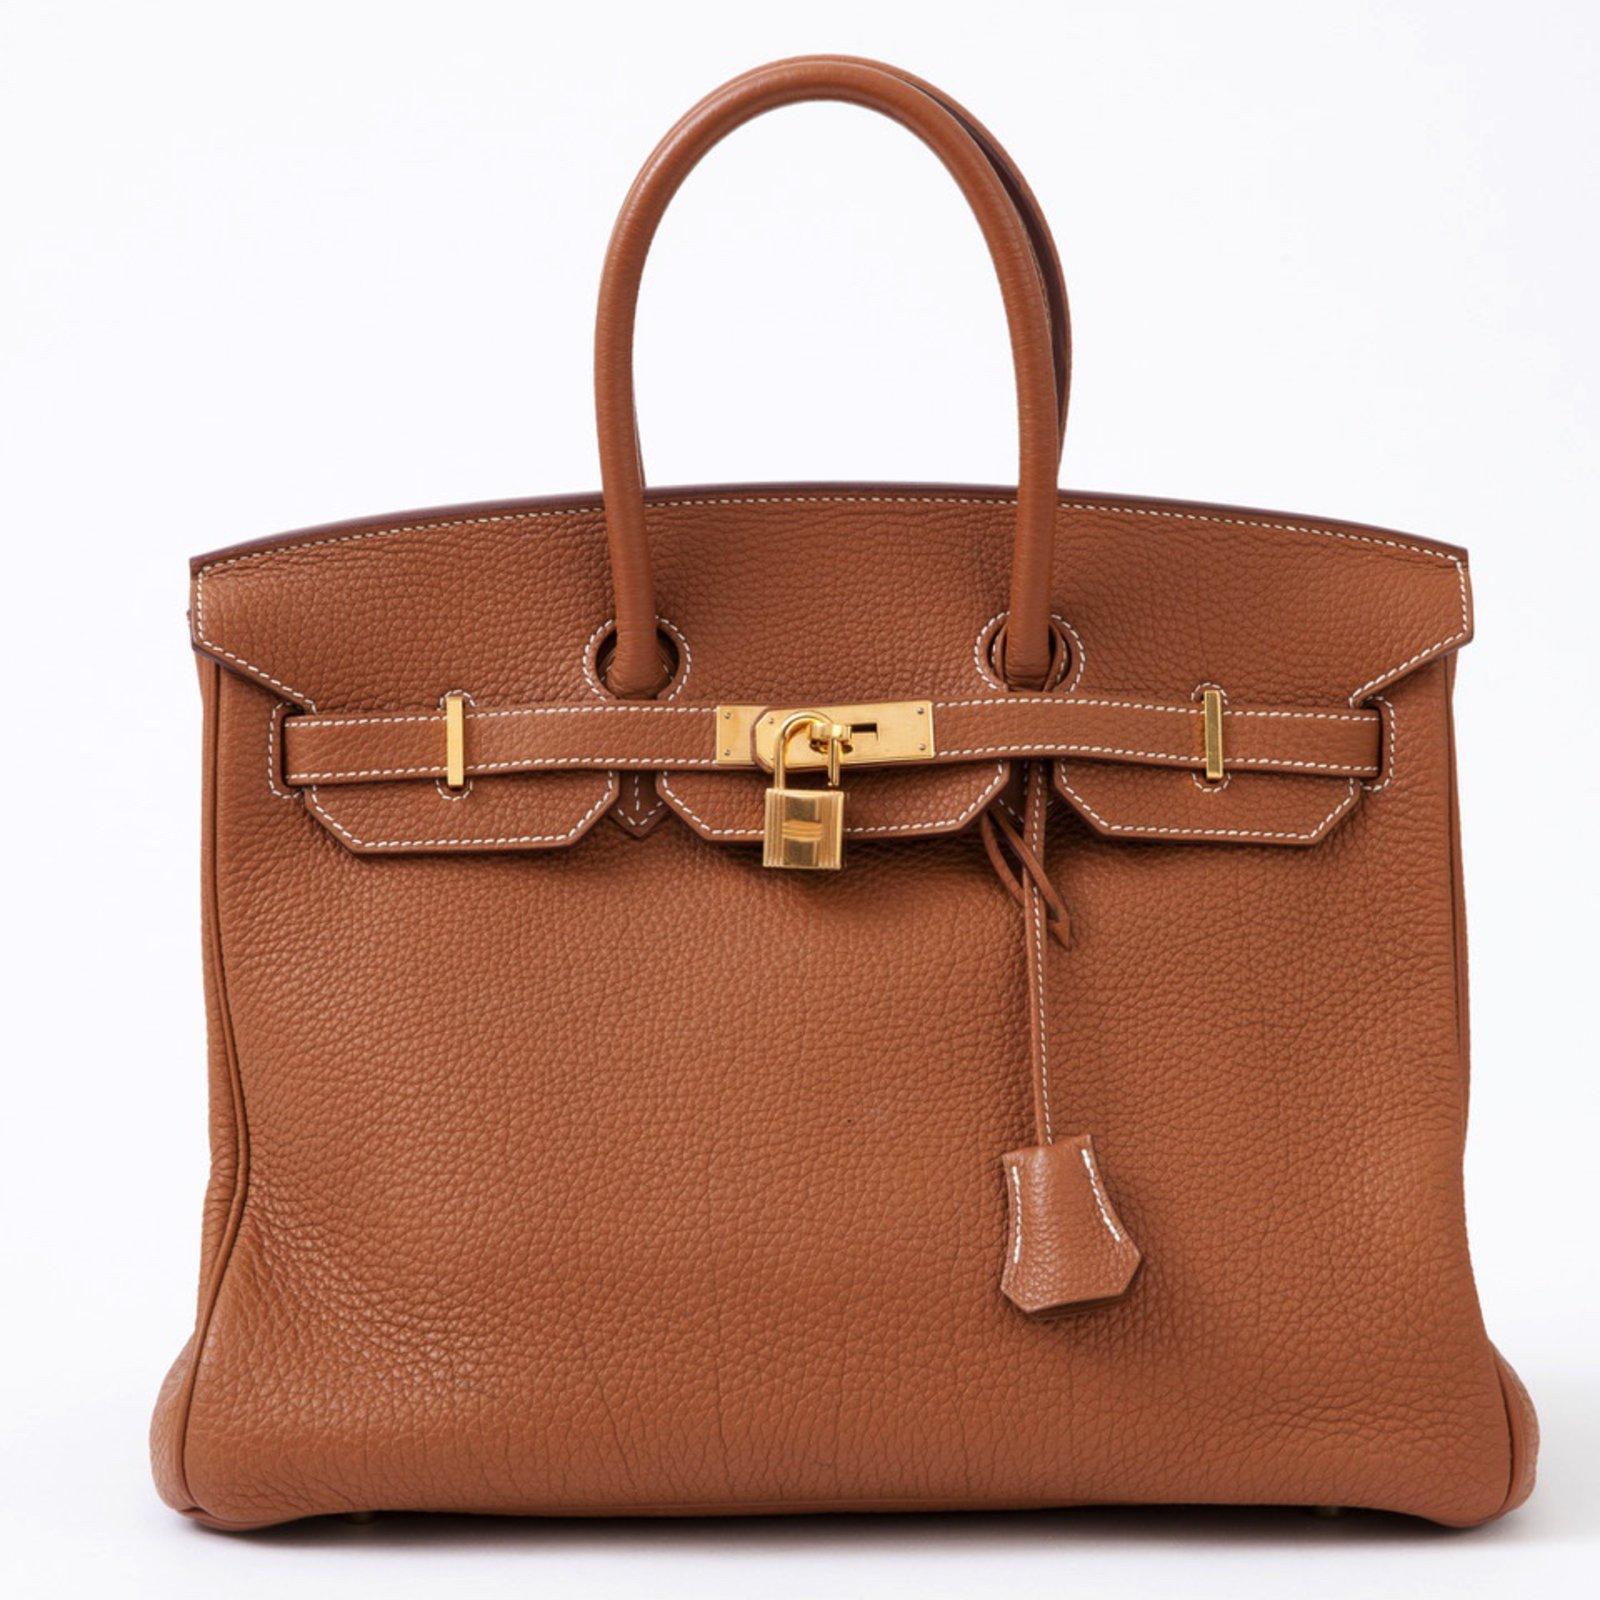 Hermès Splendid Birkin 35 Bag In Togo Gold Leather Very Good Condition Handbags